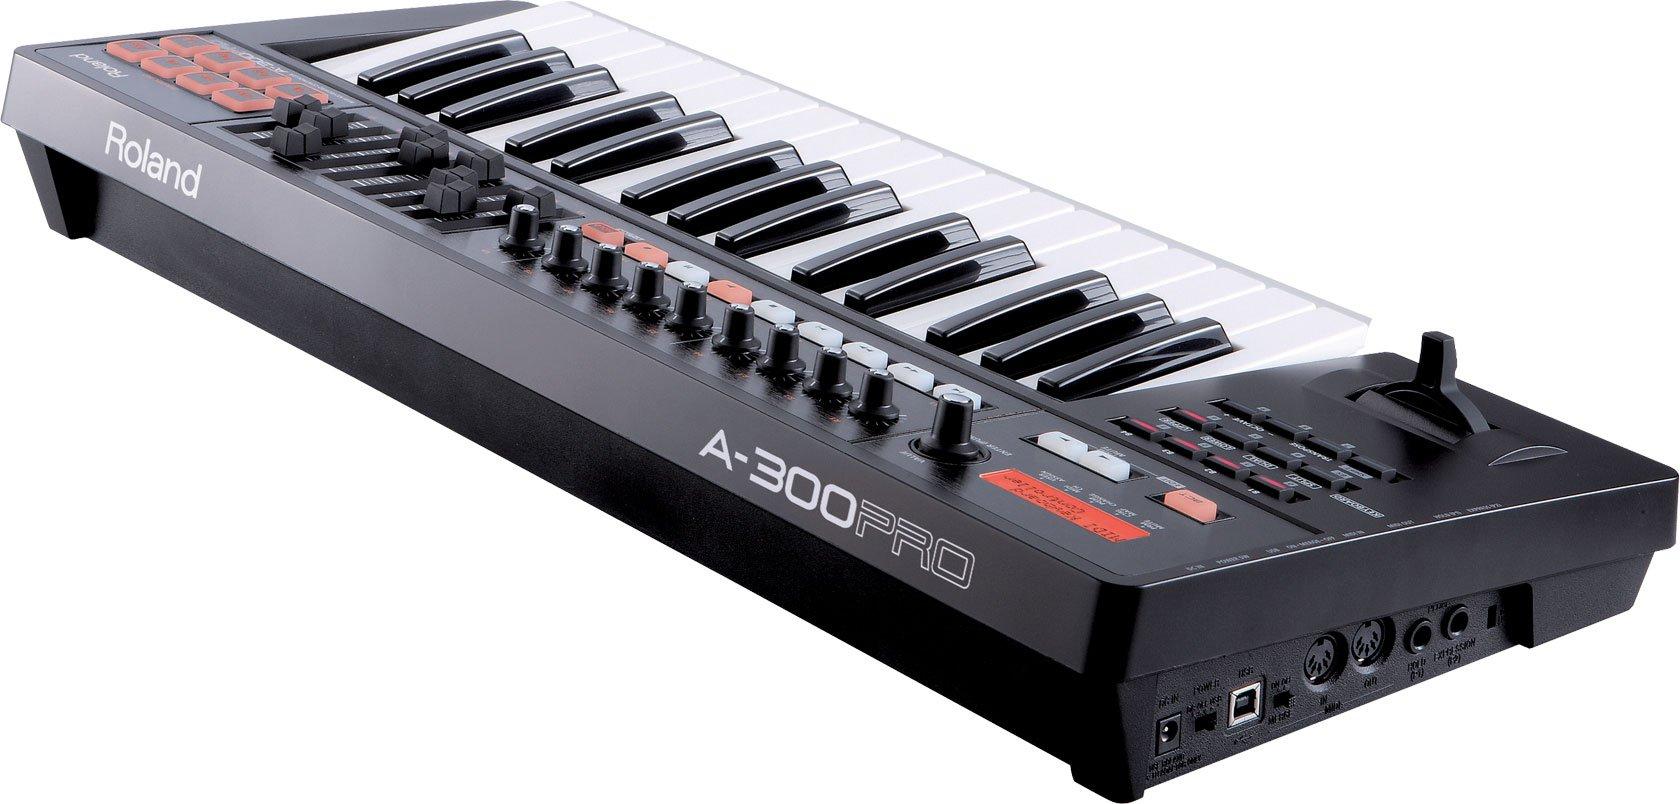 Roland 32-key MIDI Keyboard Controller, black (A-300PRO-R) by Roland (Image #3)